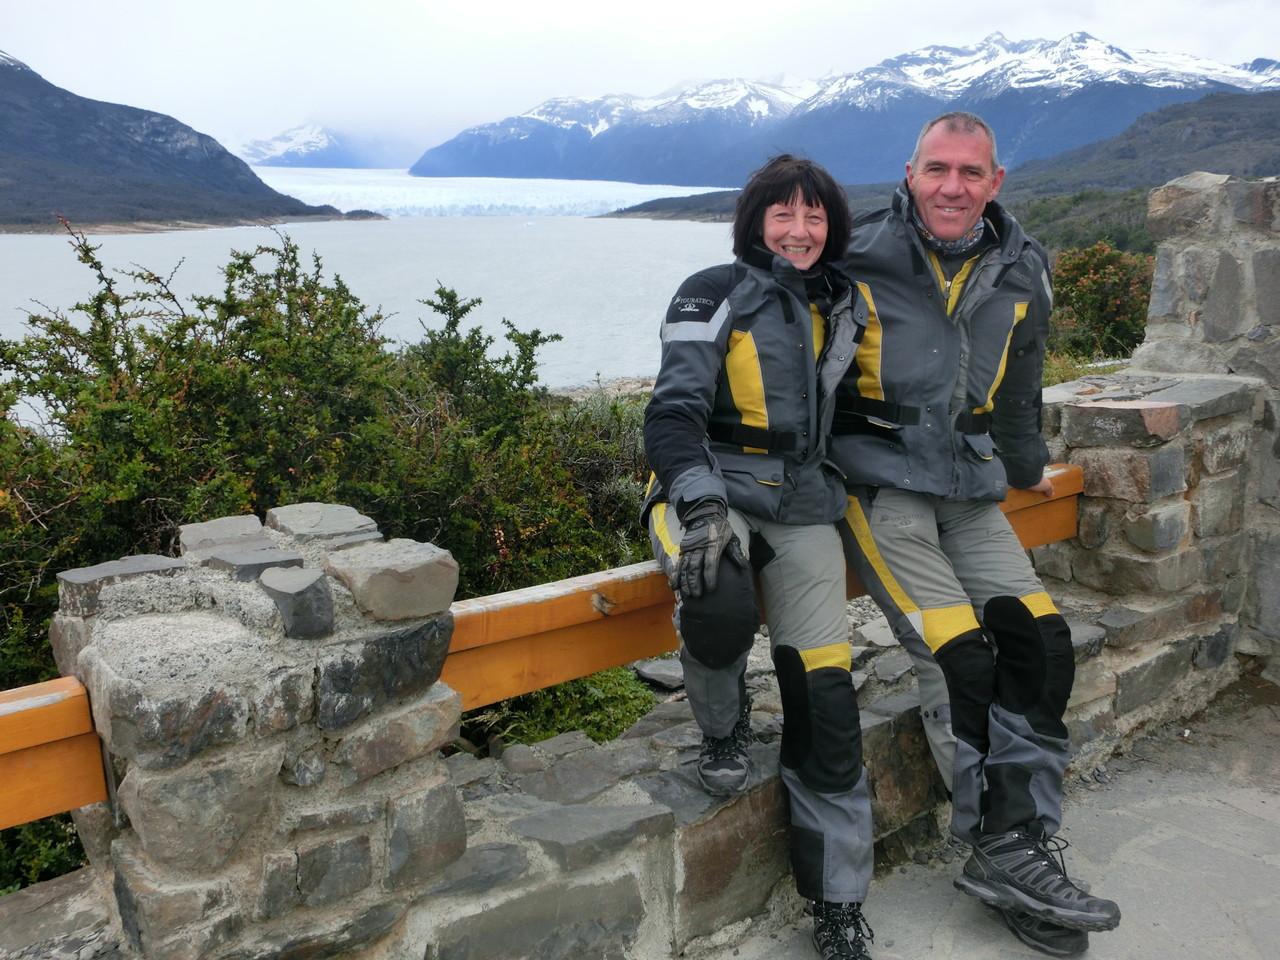 Vor dem Perito Moreno Gletscher